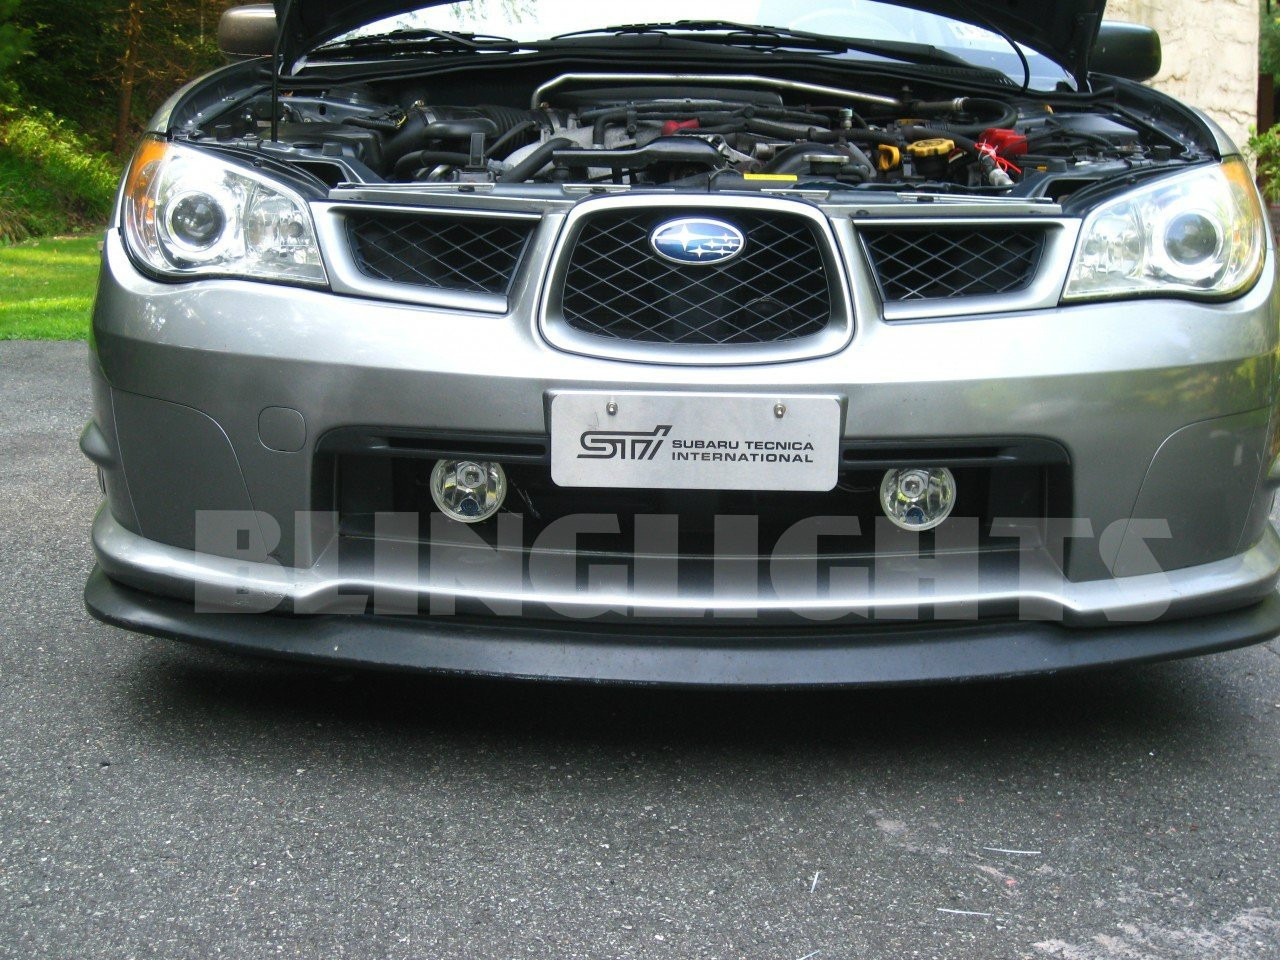 hight resolution of subaru impreza wrx sti grille xenon fog lamps lights kit blinglights com